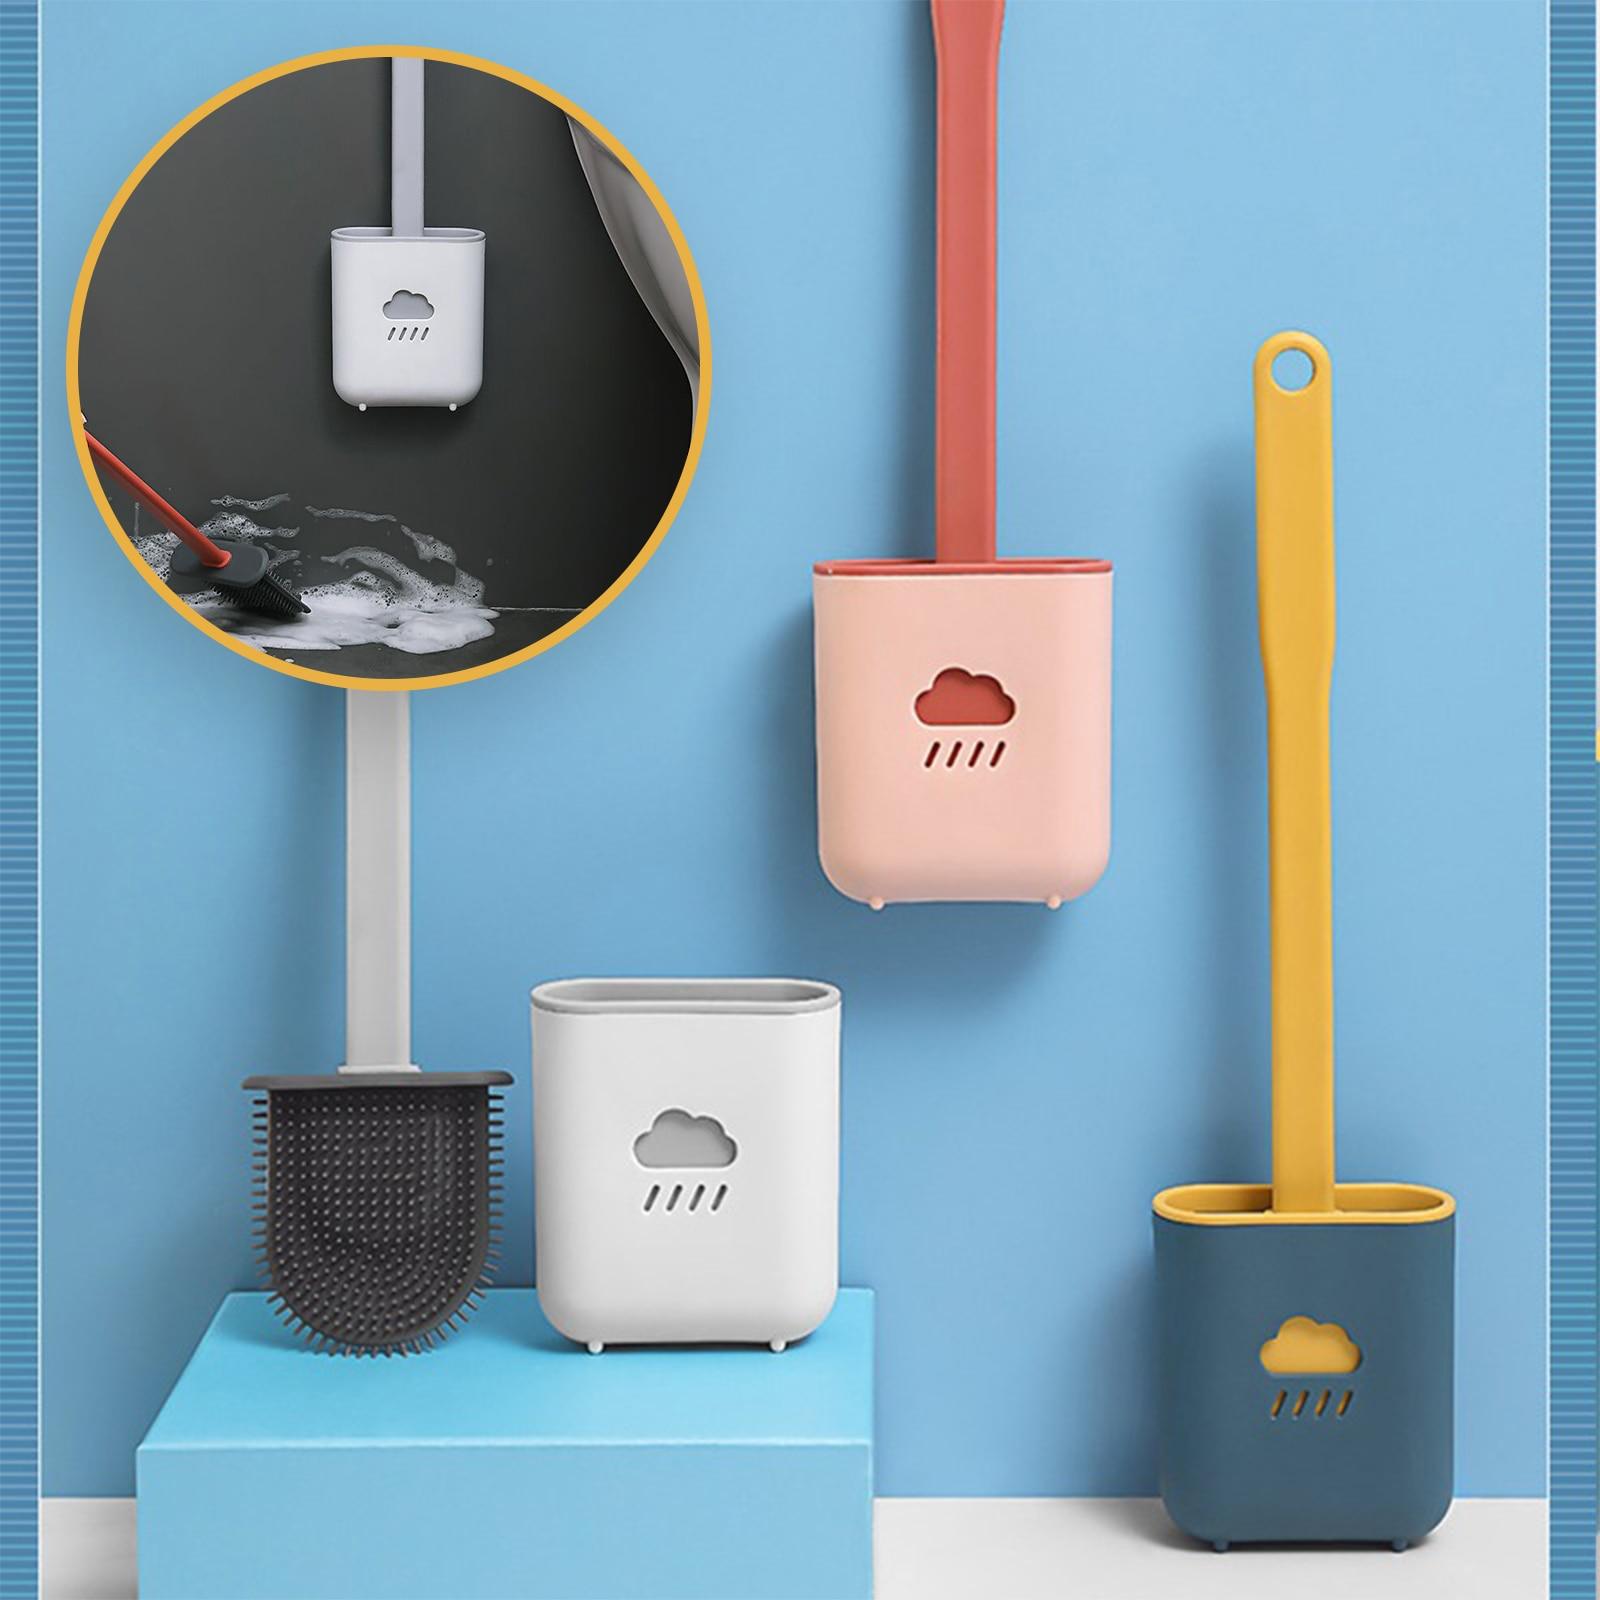 Toilet Brush Wc Gap Brush with Holder Silicone Toilet Brush Hanging Type Flat Head Flexible Bristles Brush Bathroom Accessories